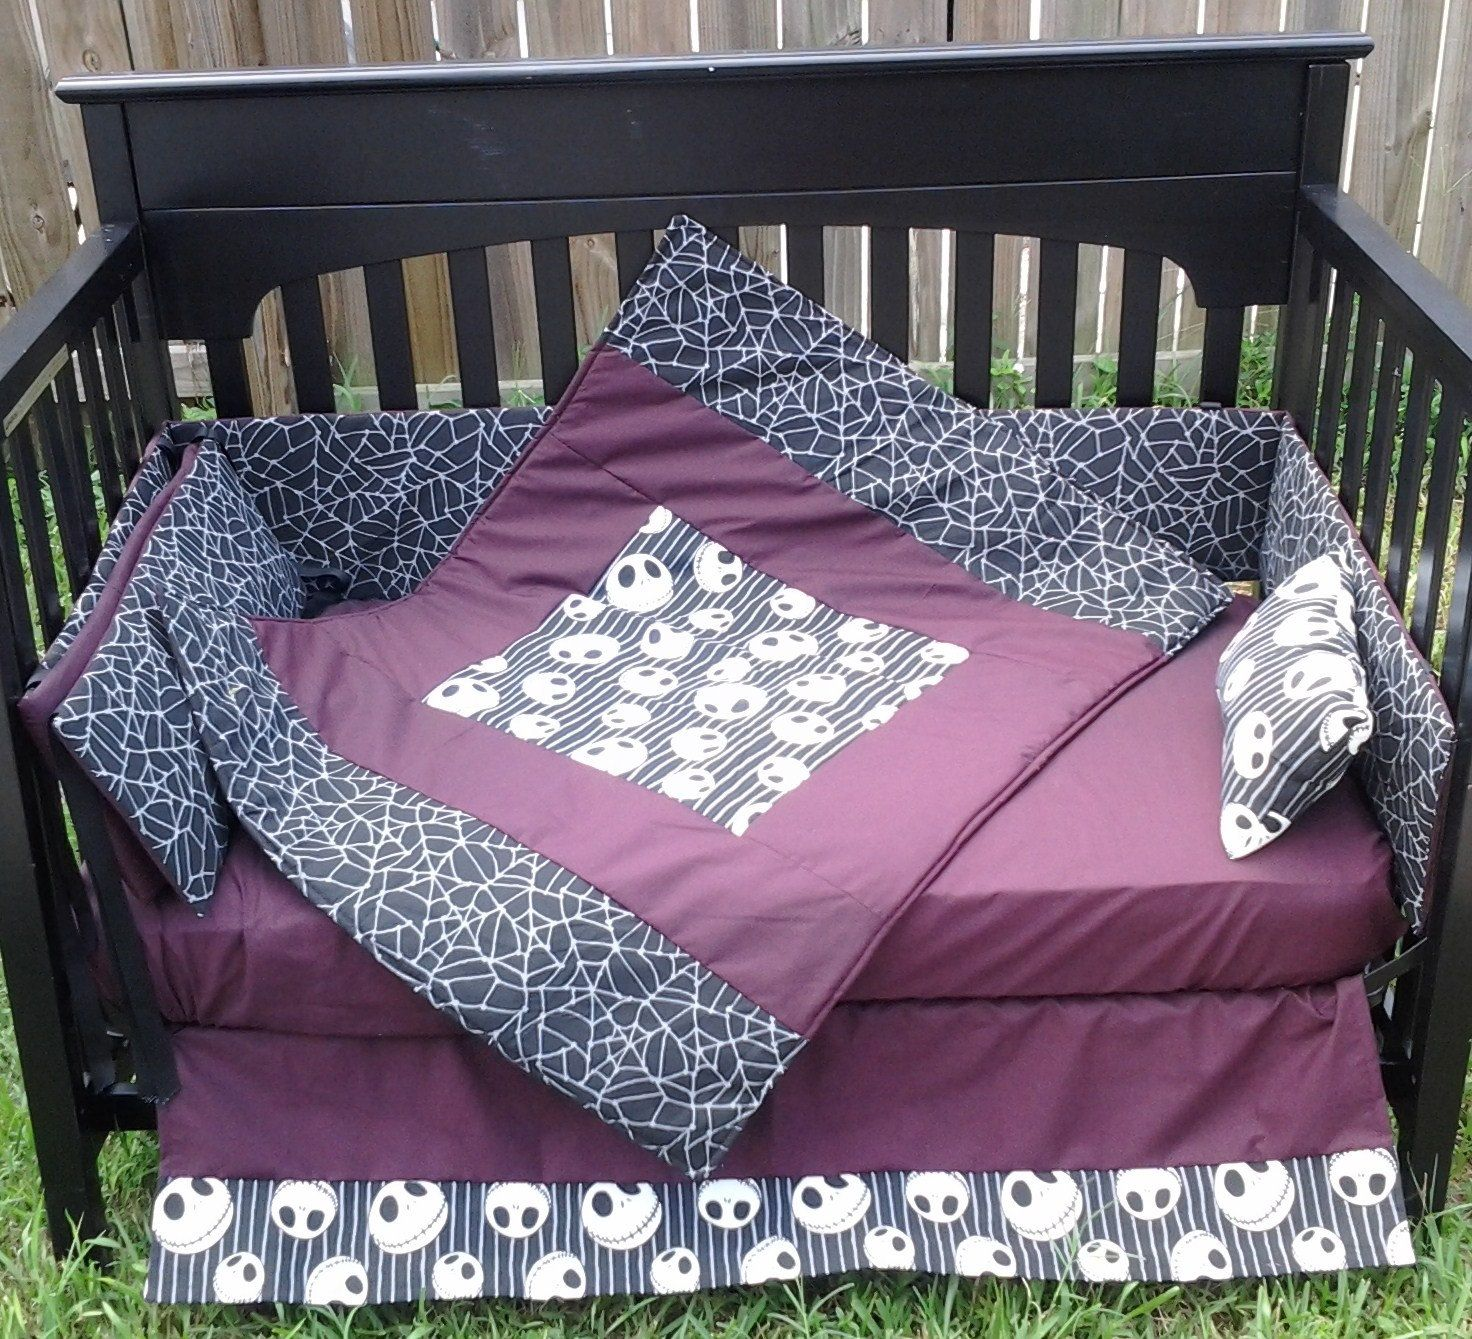 New Nightmare Before Christmas Crib Bedding Set M W New Jack Nbc Fabric 300 00 Via Etsy In 2020 Crib Bedding Sets Baby Themes Funky Bedding